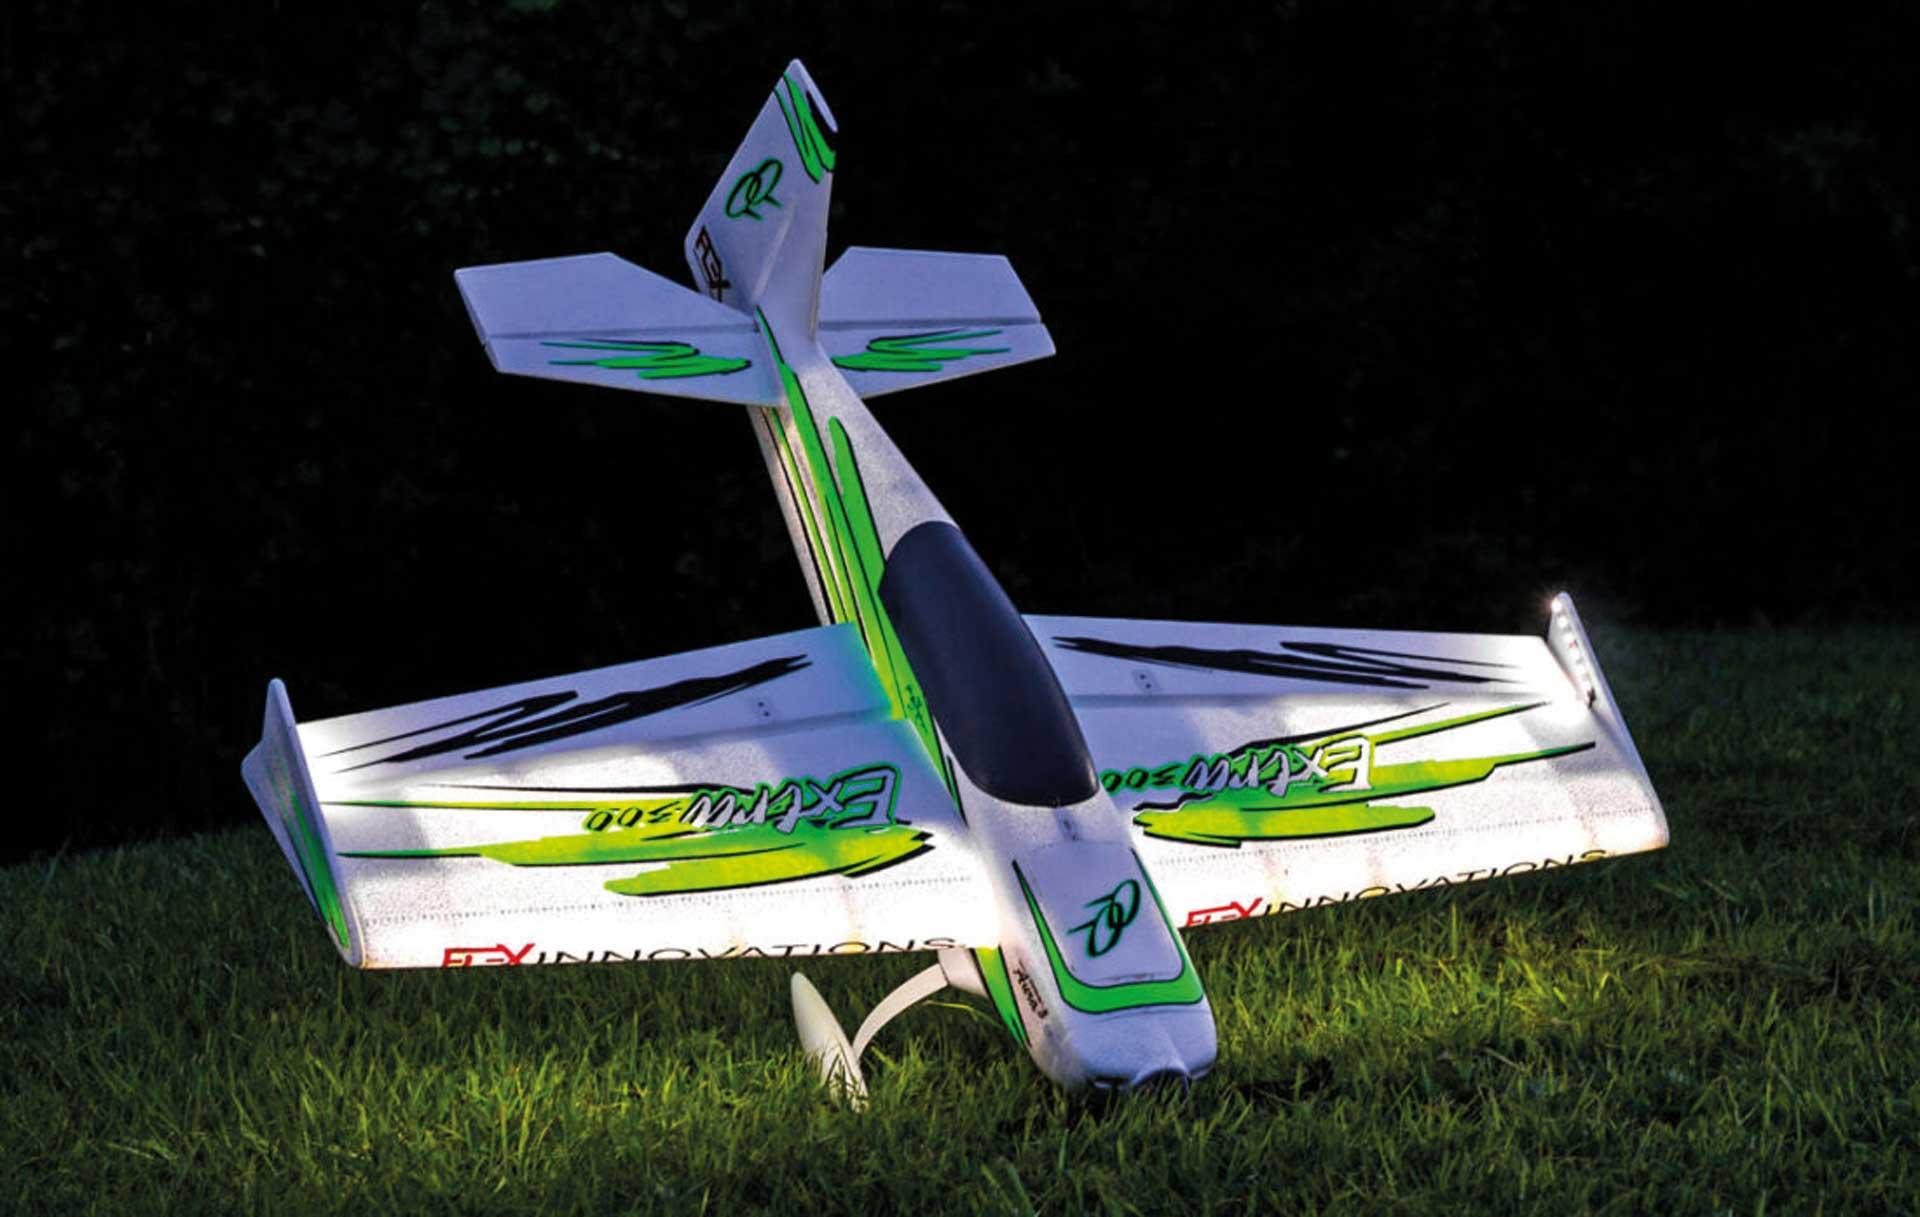 PREMIER AIRCRAFT QQ EXTRA 300 V2 ROT/SCHWARZ NIGHT SUPER PNP MIT LED BELEUCHTUNG UND AURA 8